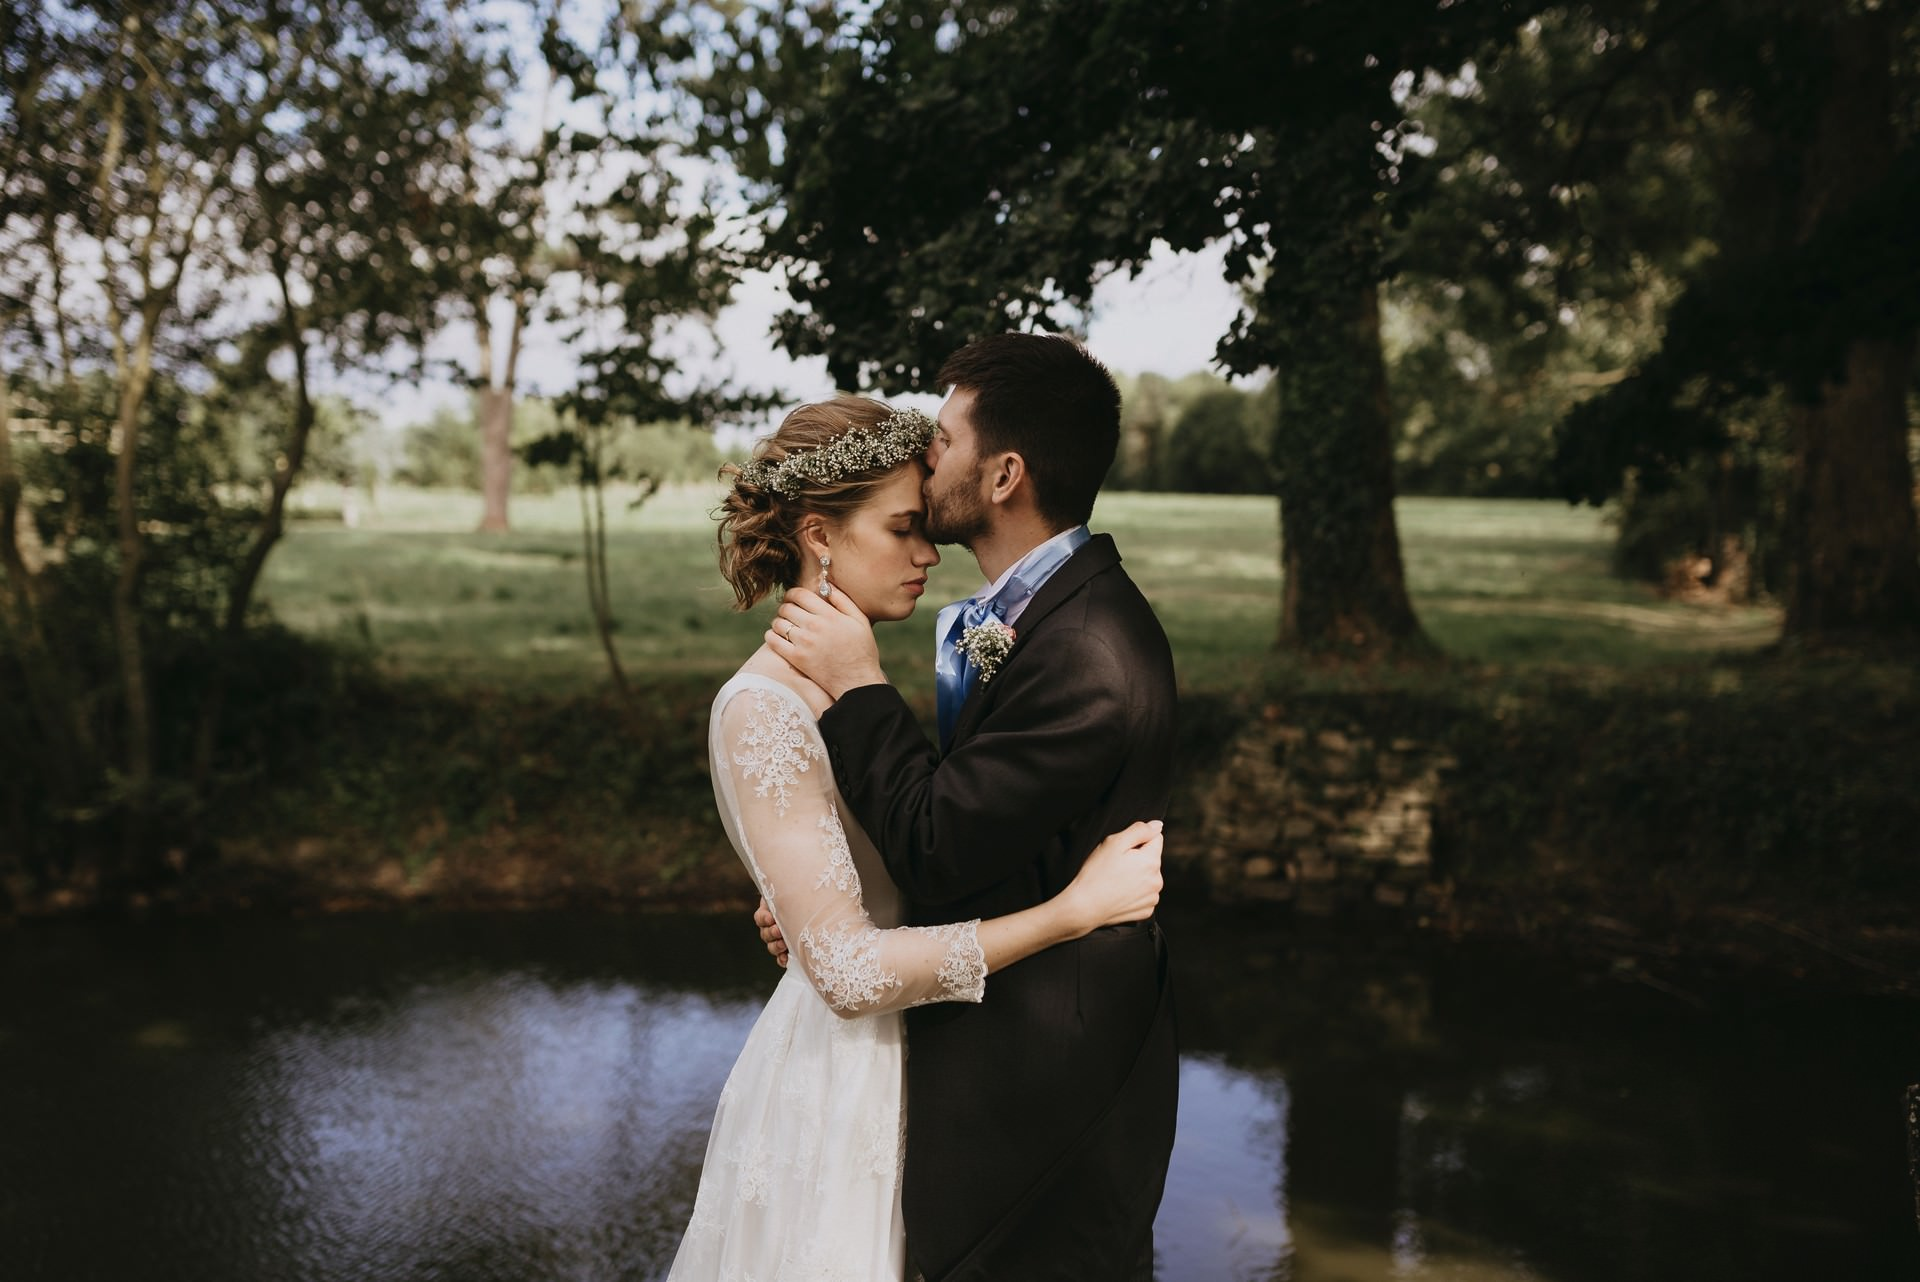 mariés étang arbres embrasser couple